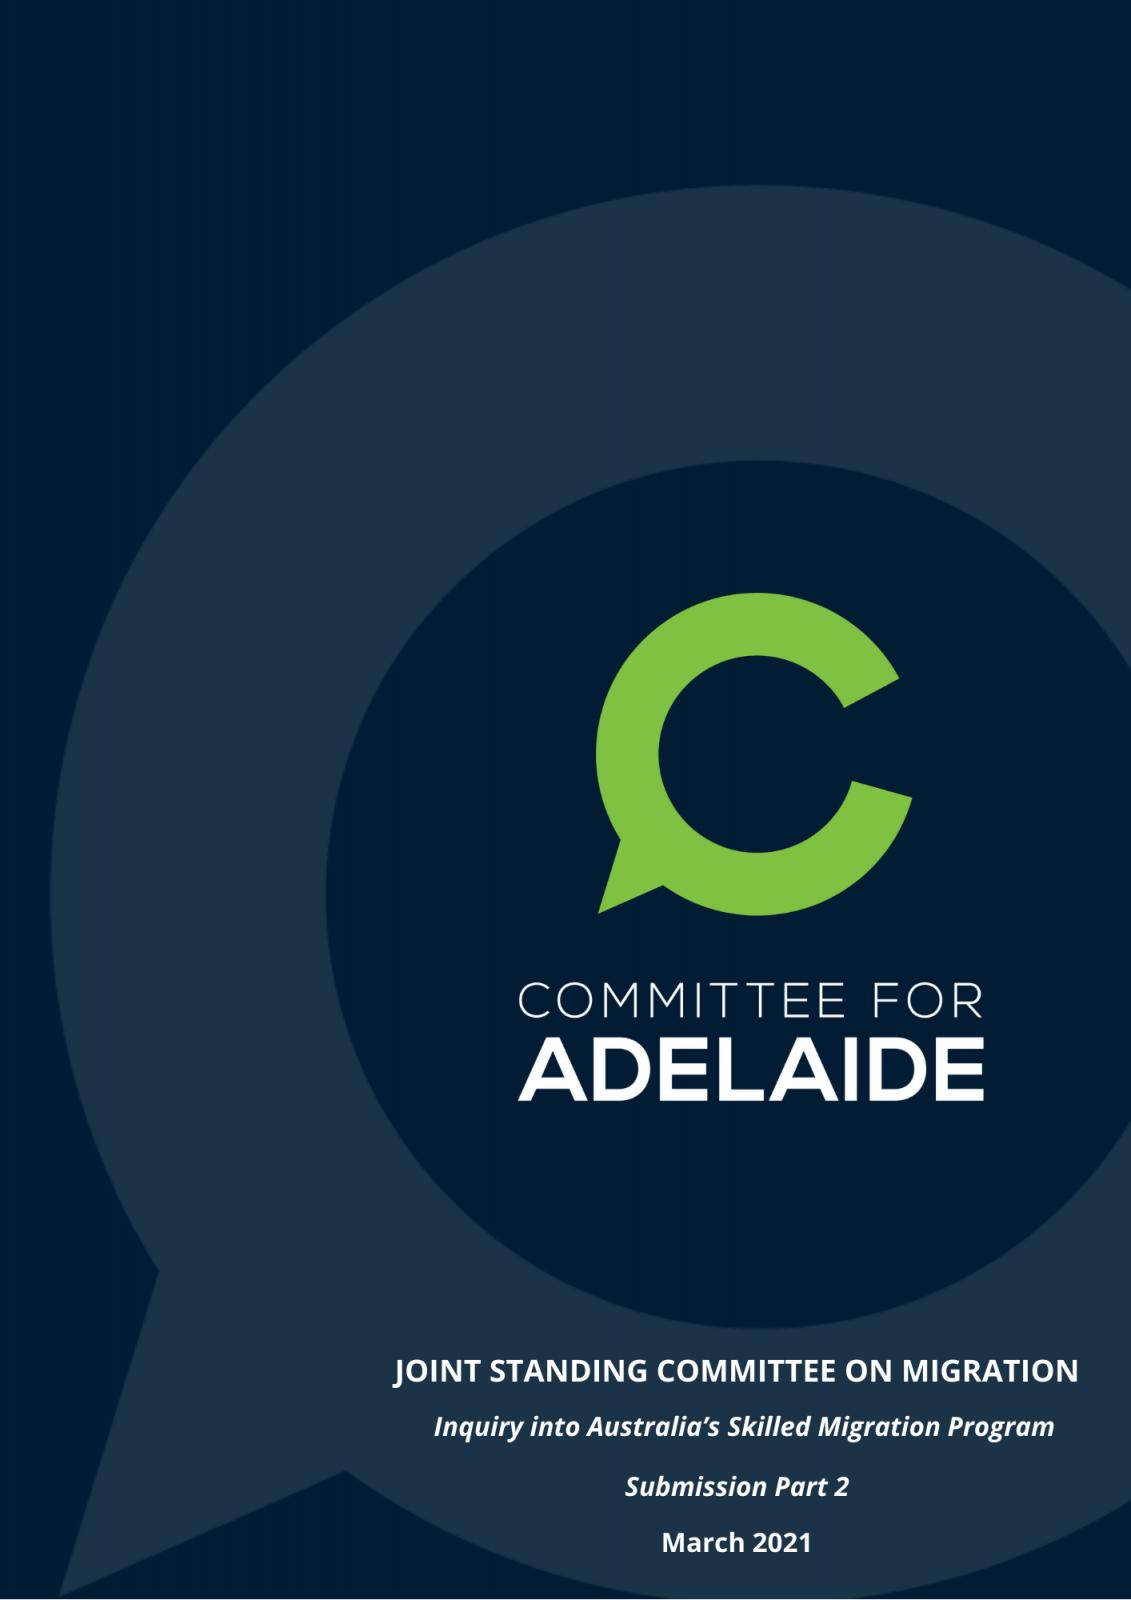 Inquiry into Australia's skilled migration program – Submission 2